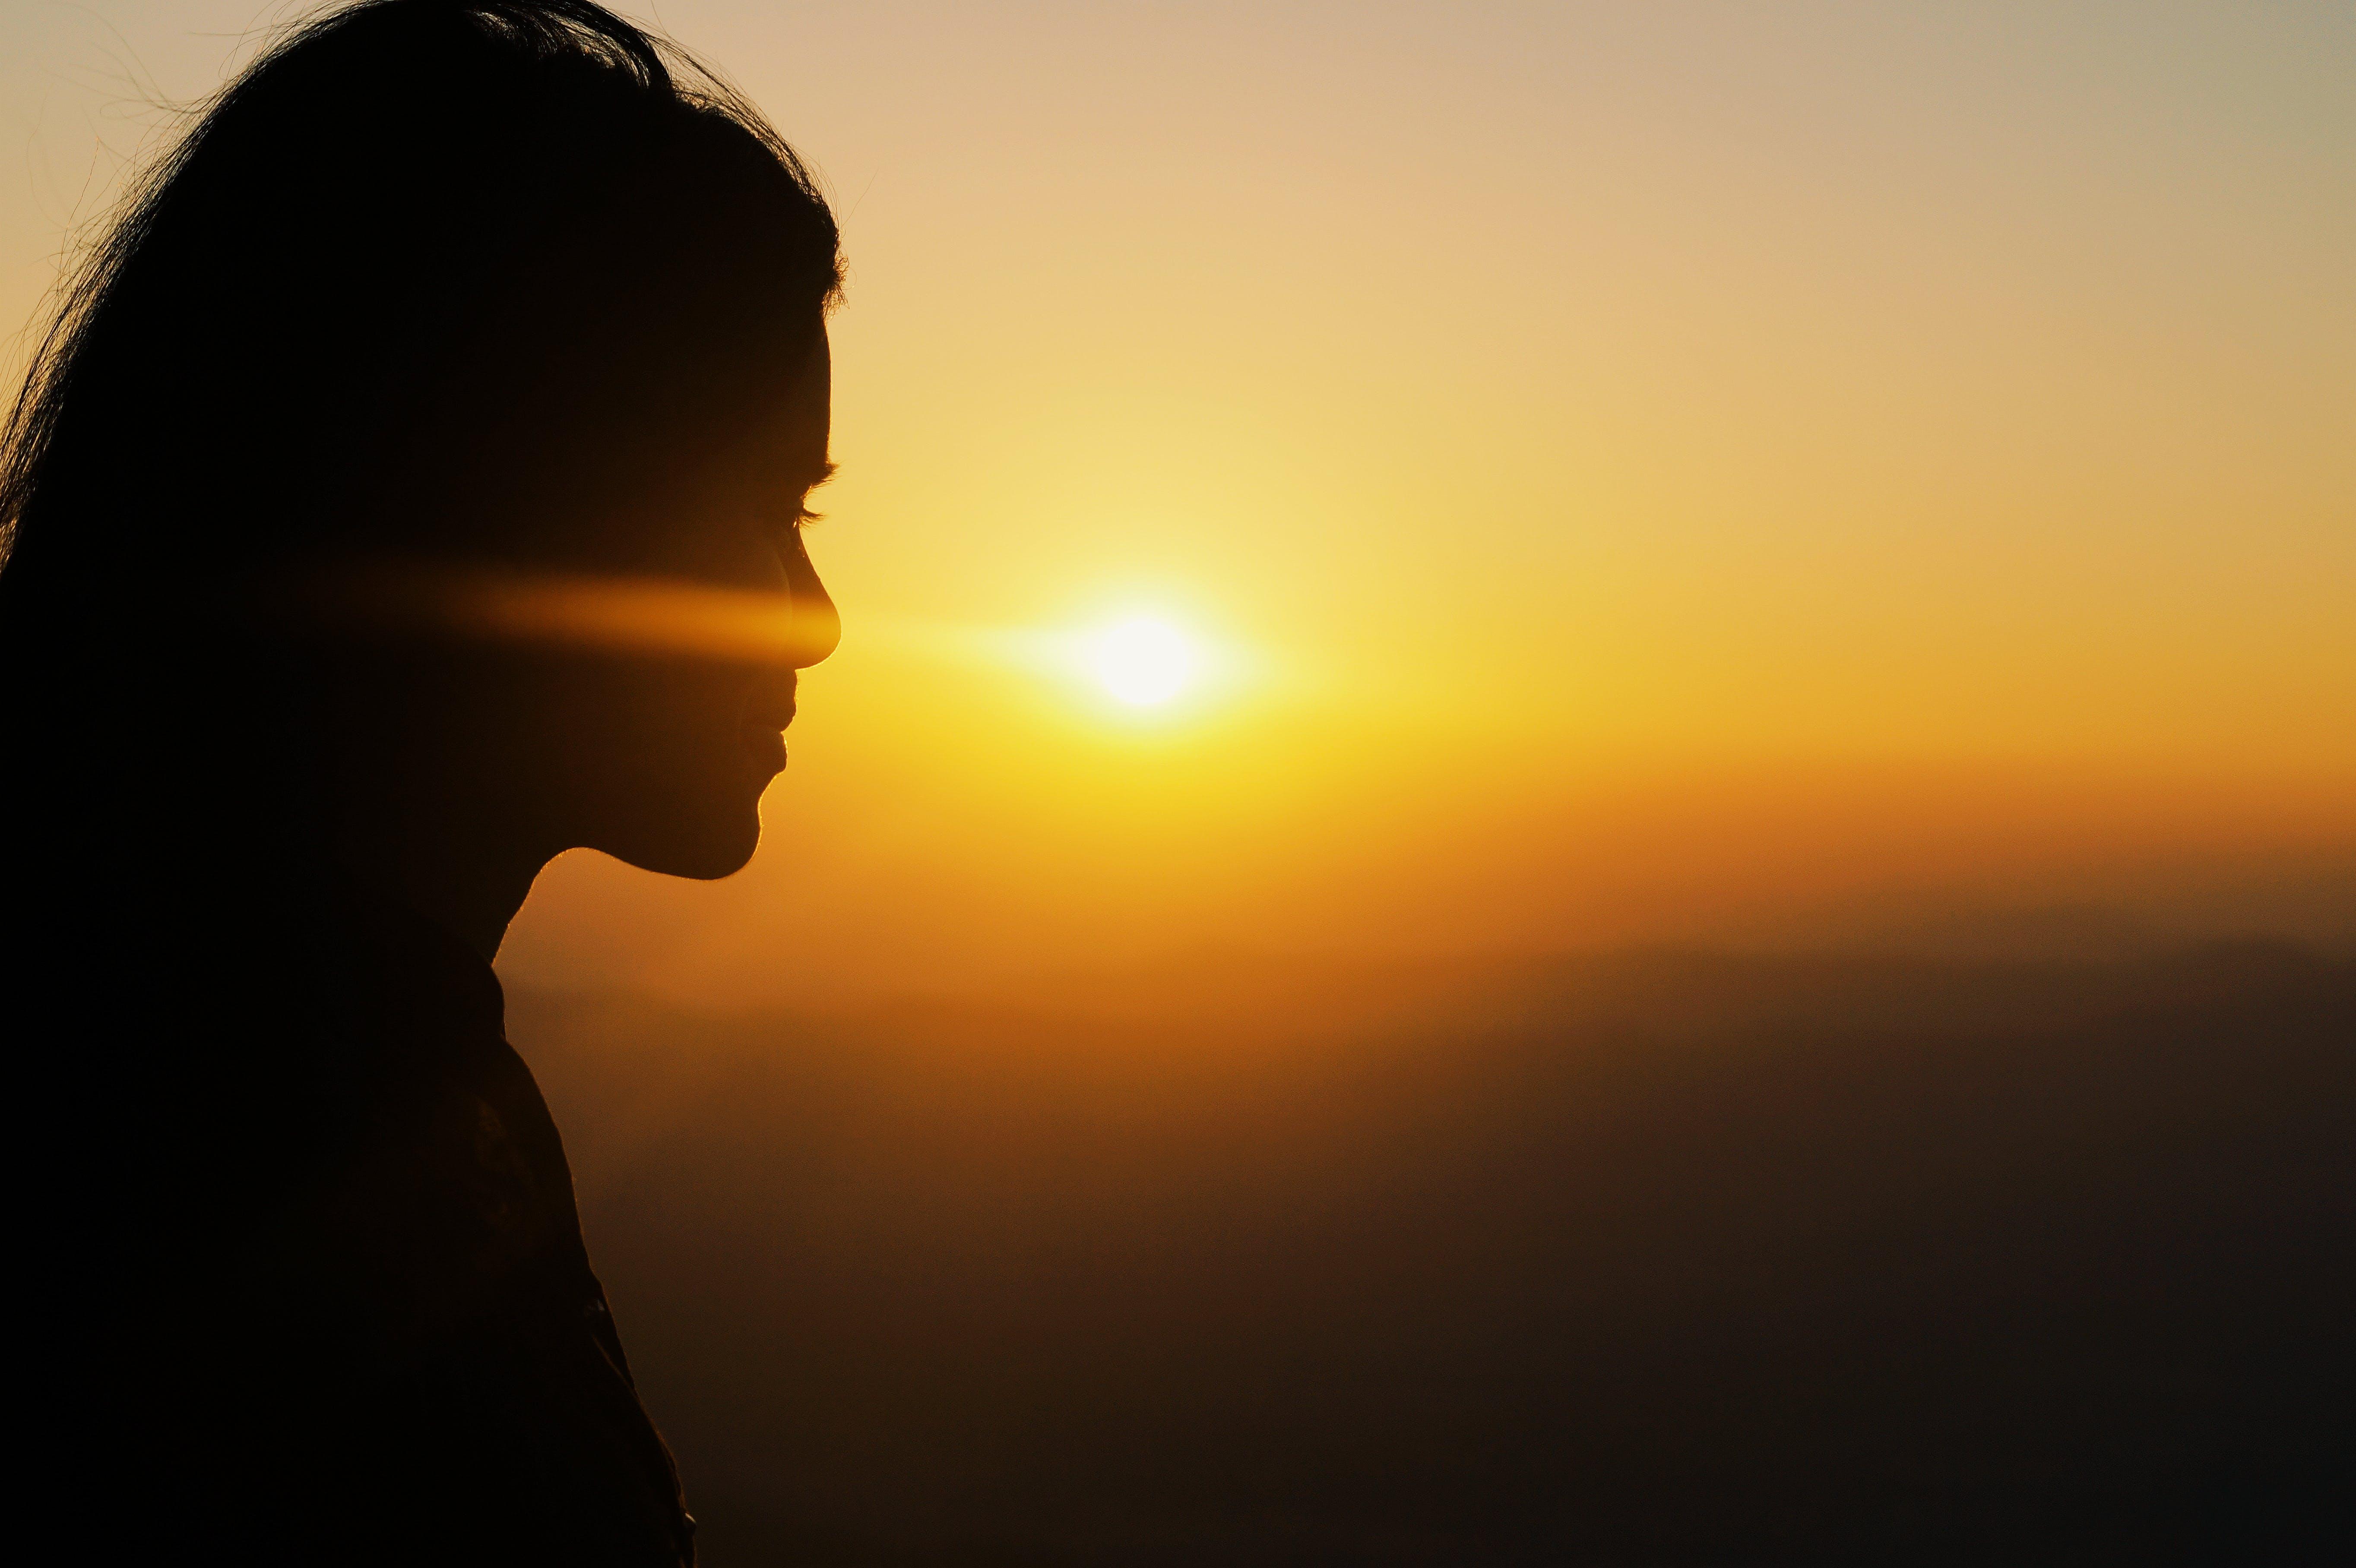 Free stock photo of sunset, girl, sunrise, yellow